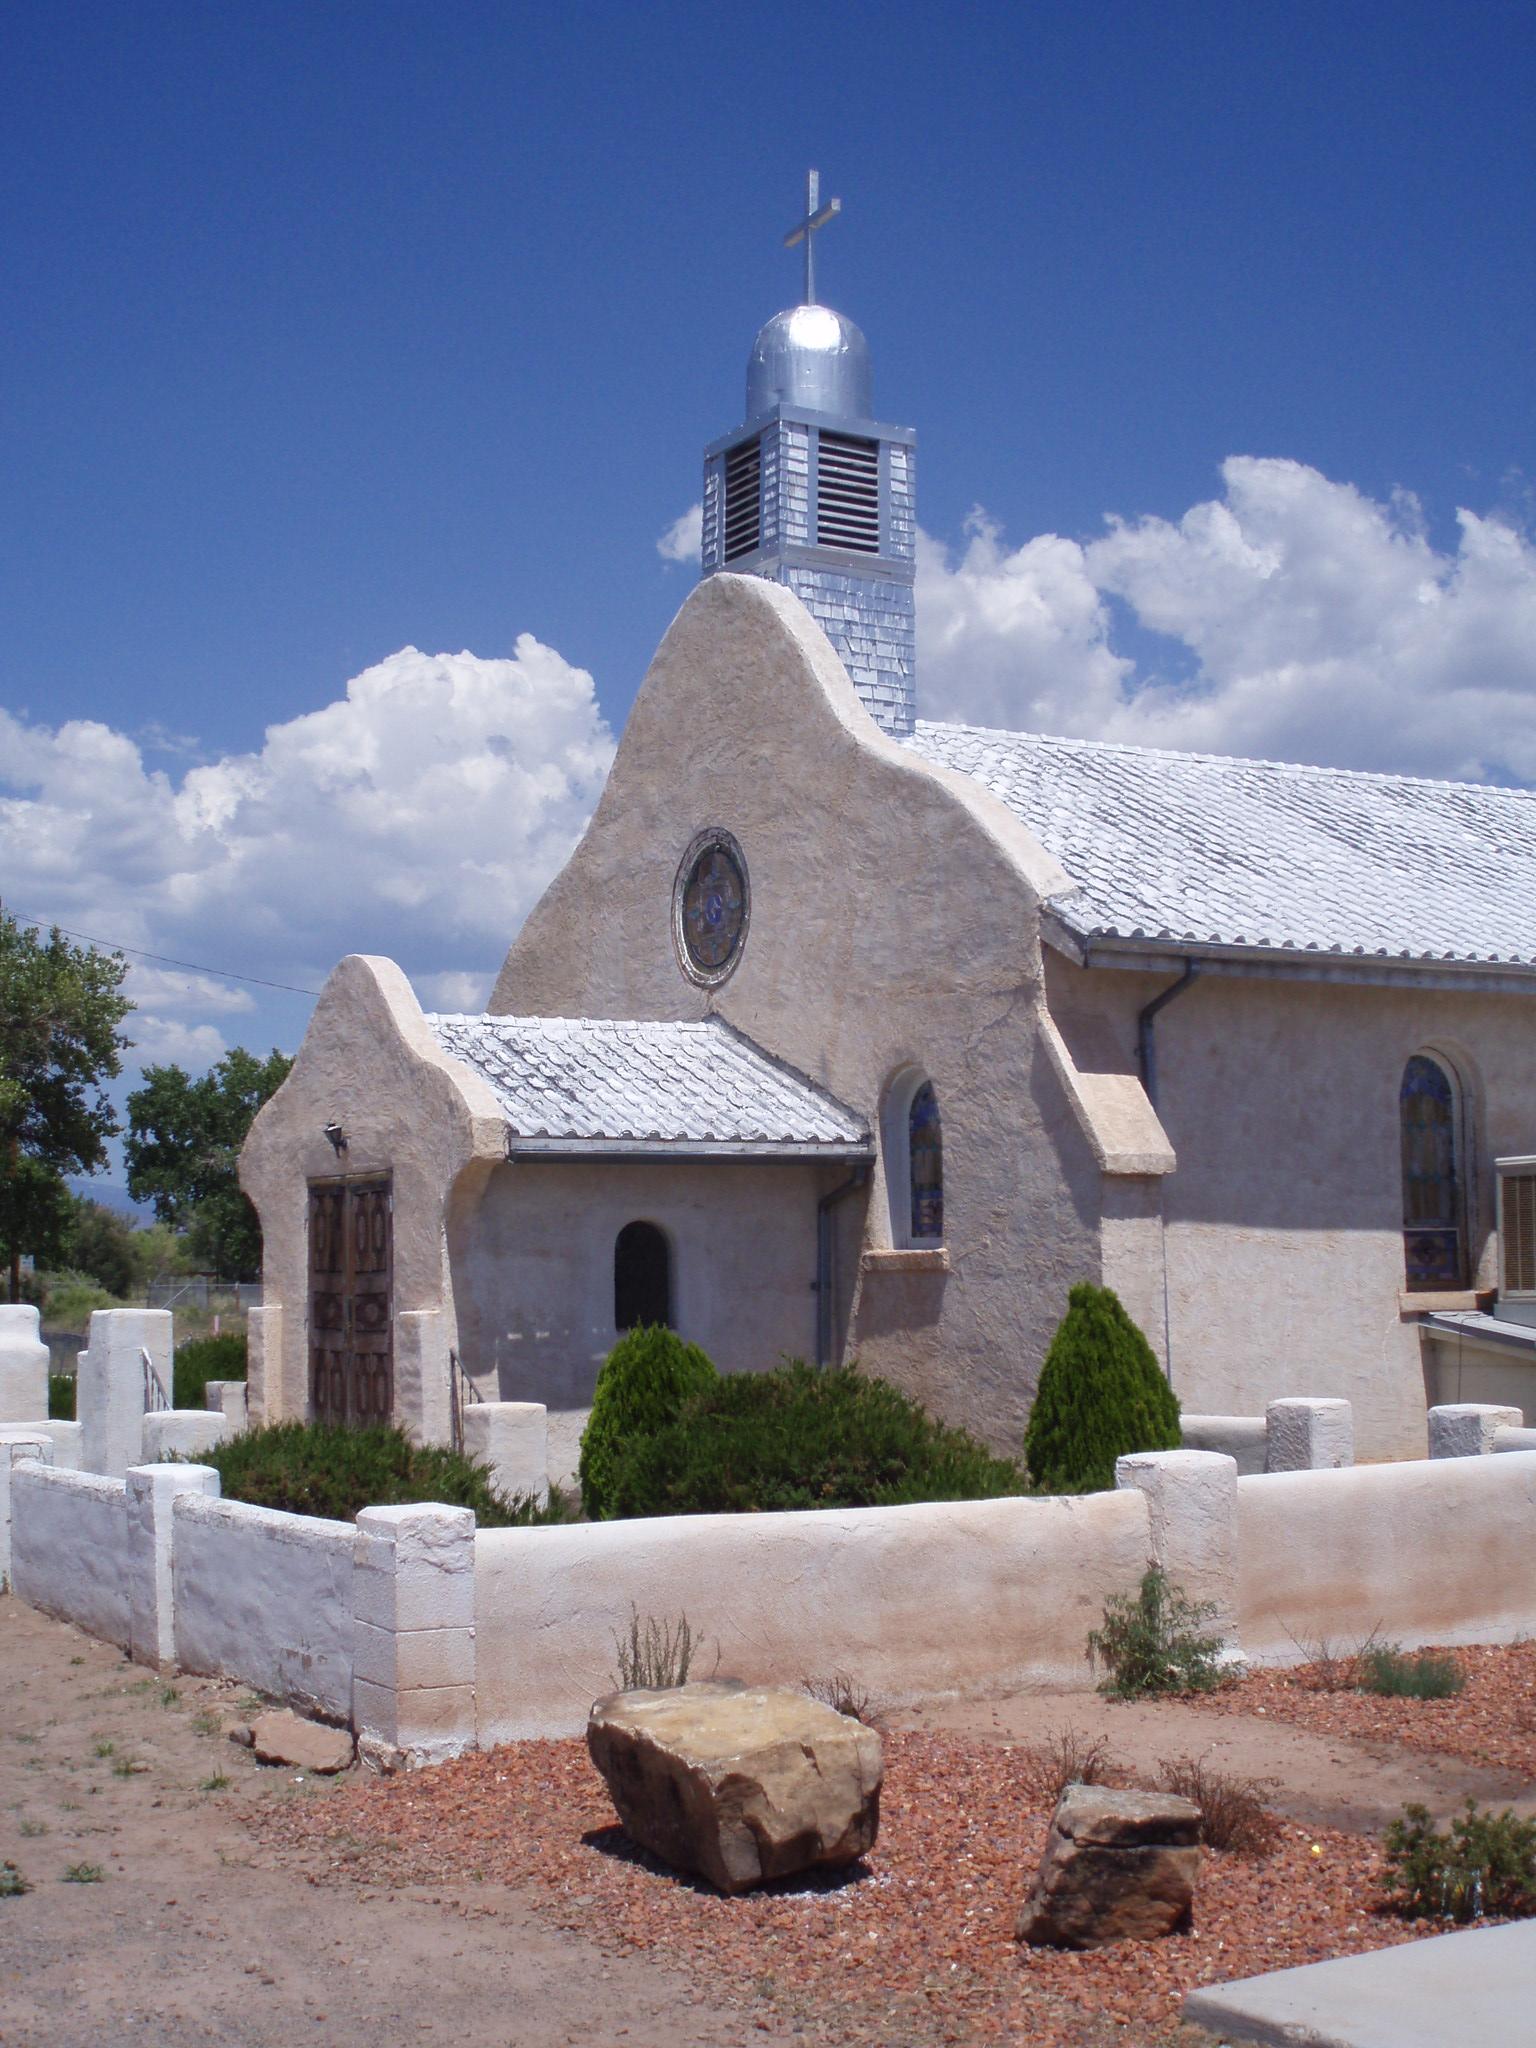 San Ysidro New Mexico Wikipedia